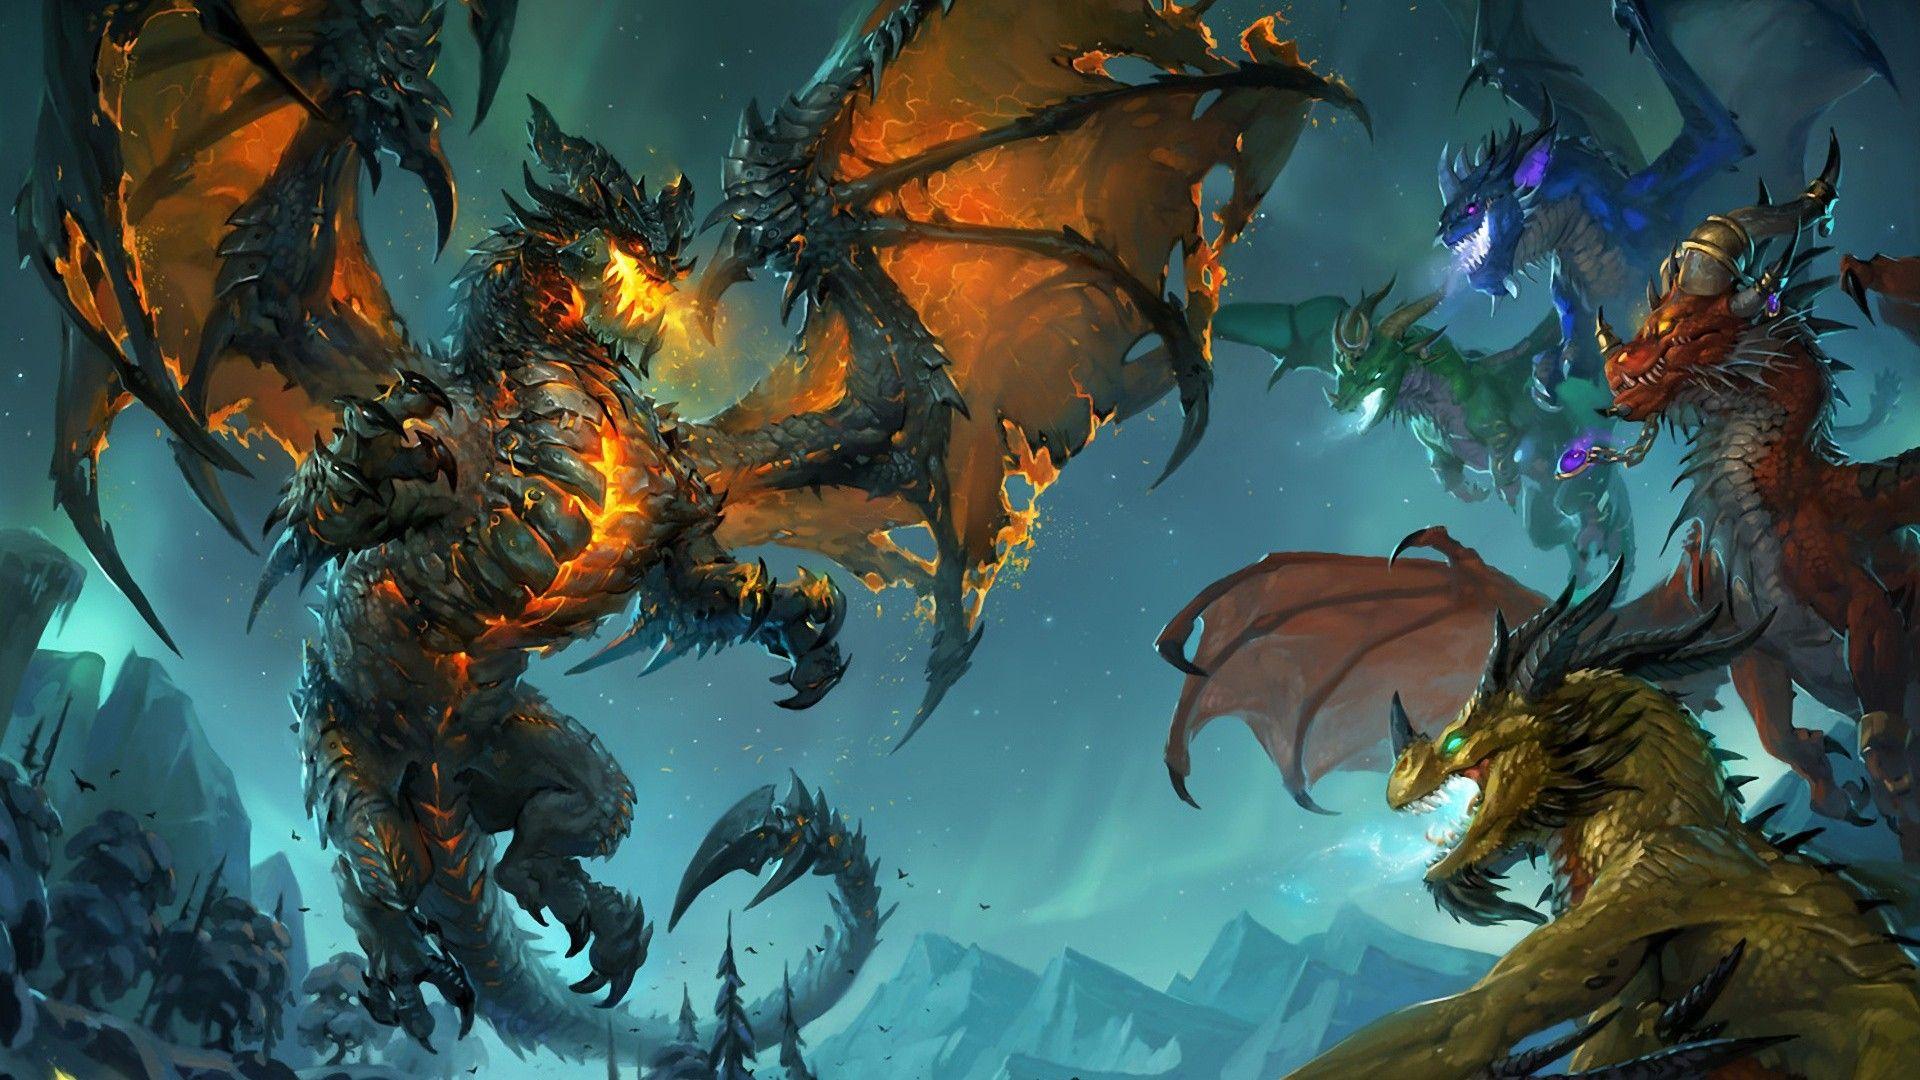 World Of Warcraft Desktop Wallpaper: World Of Warcraft Desktop Wallpapers (27 Wallpapers